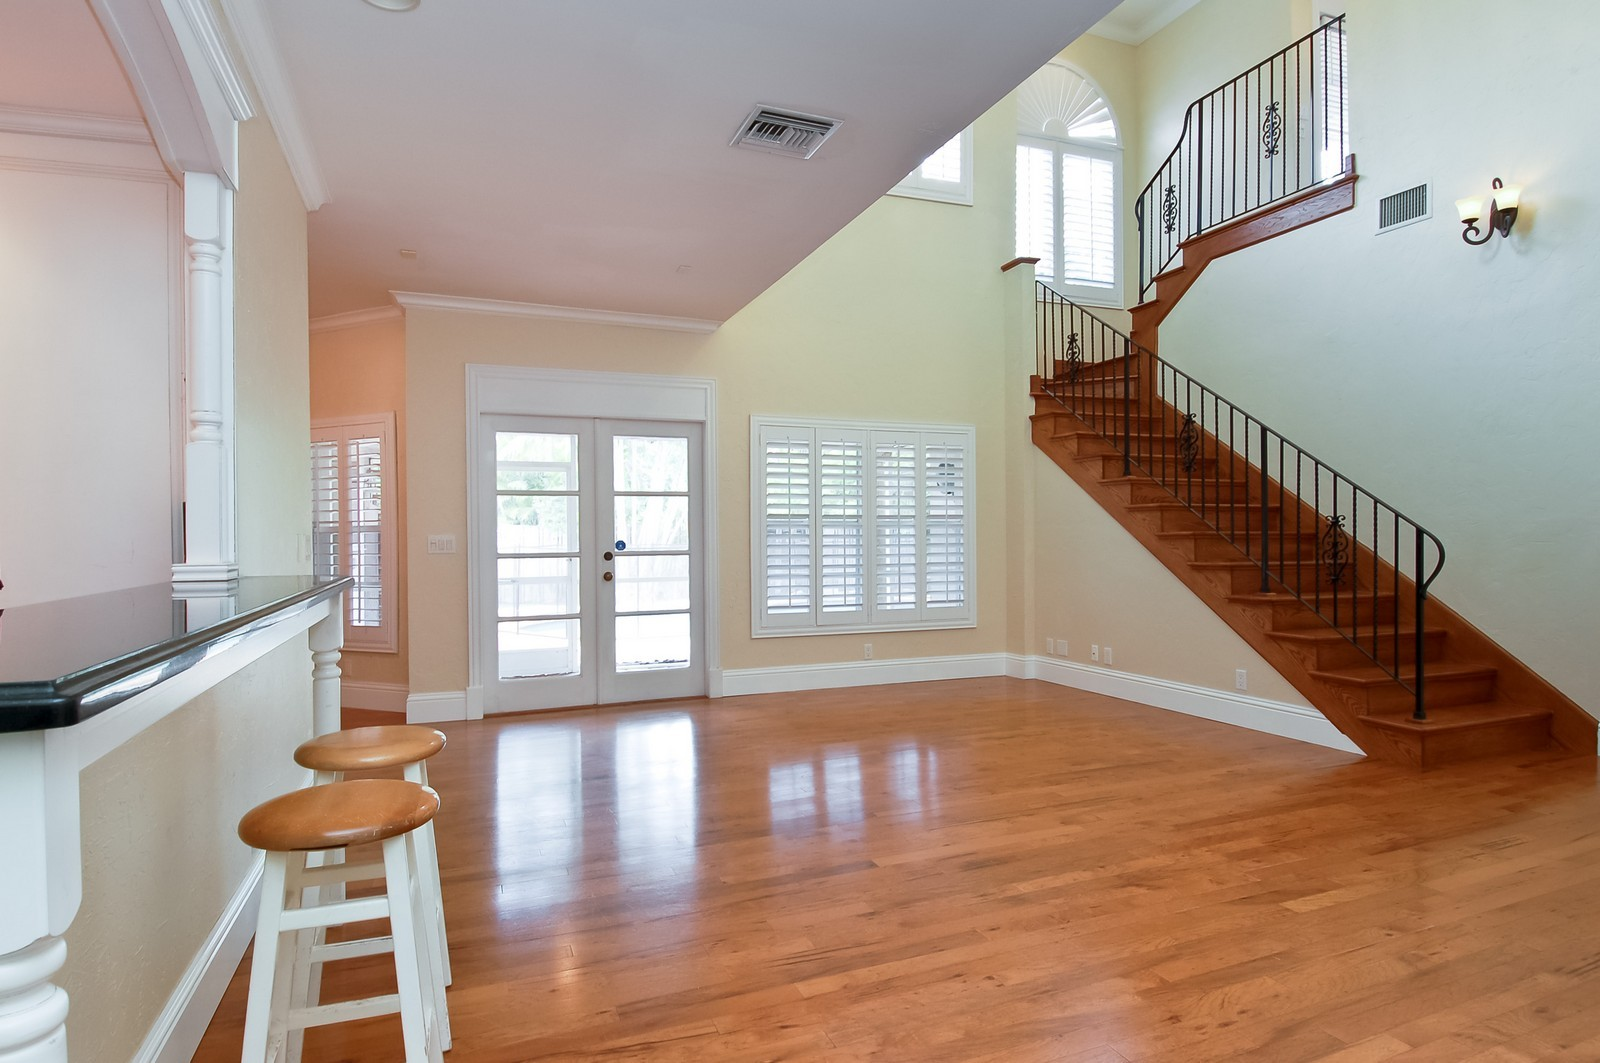 Real Estate Photography - 899 Azalea St, Boca Raton, FL, 33486 - Family Room